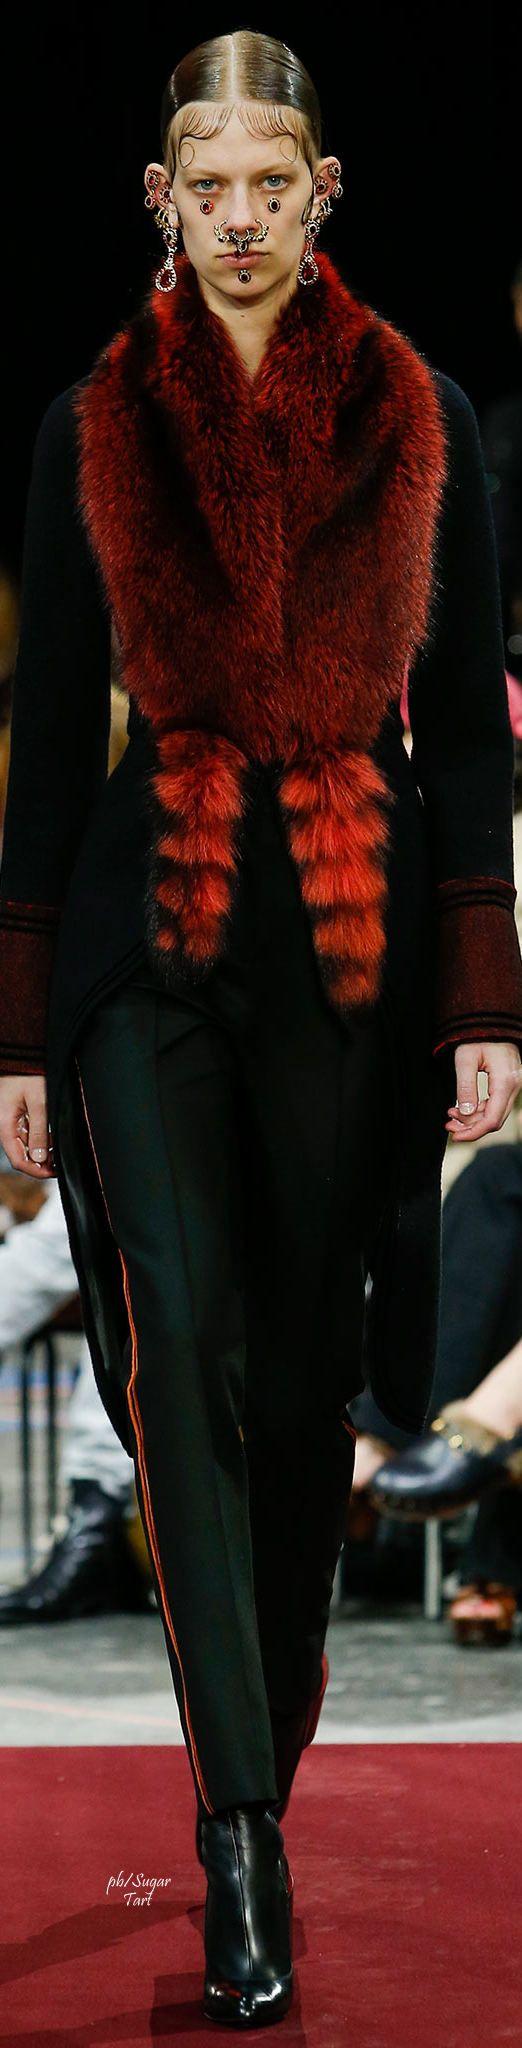 Givenchy Fall 2015 RTW